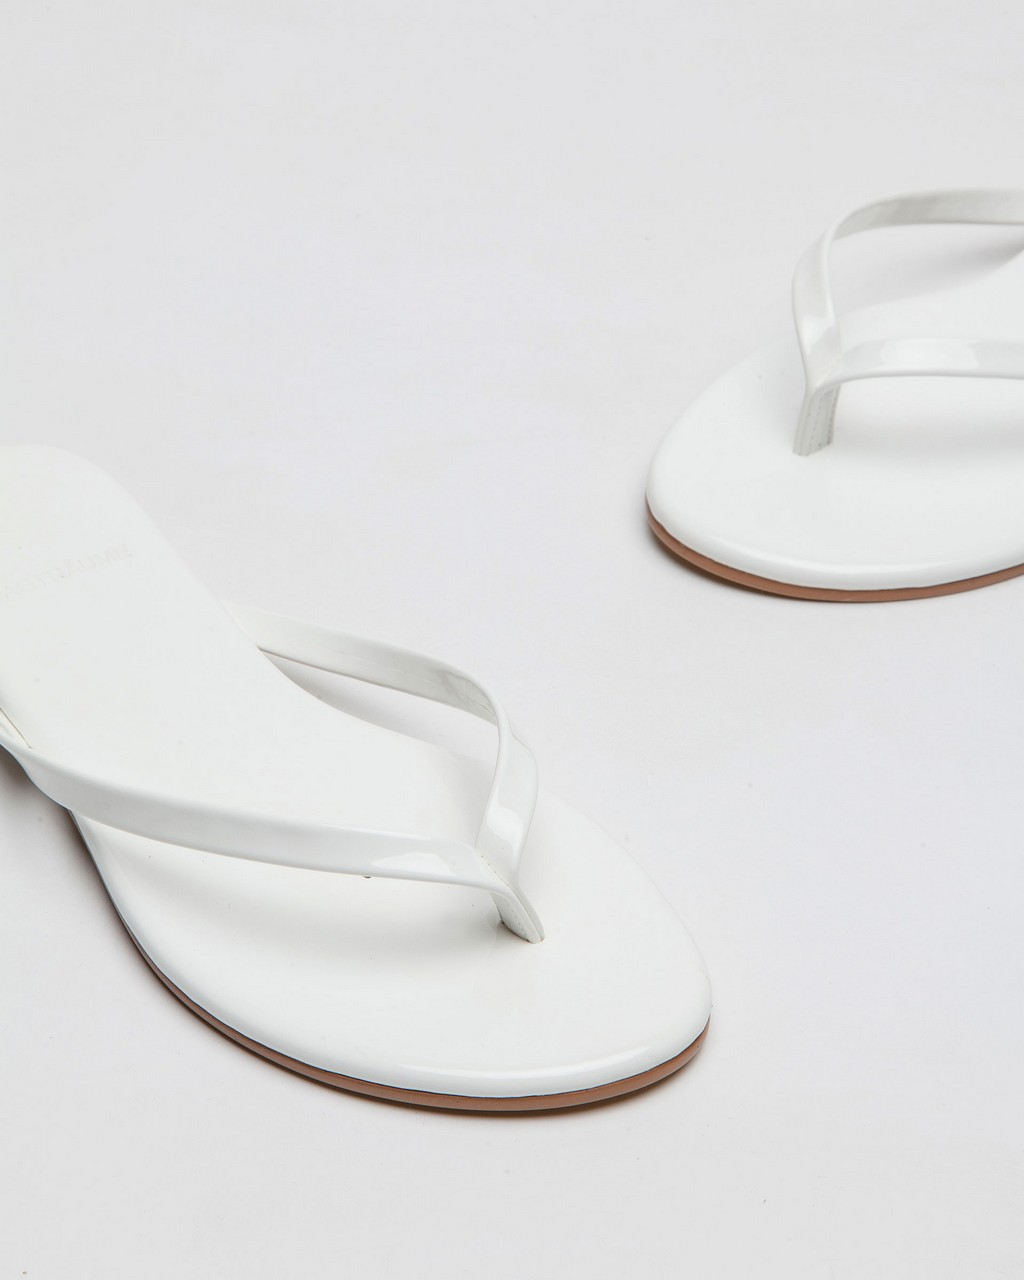 Tagtraume Plasma - White Enamel(화이트 에나멜)